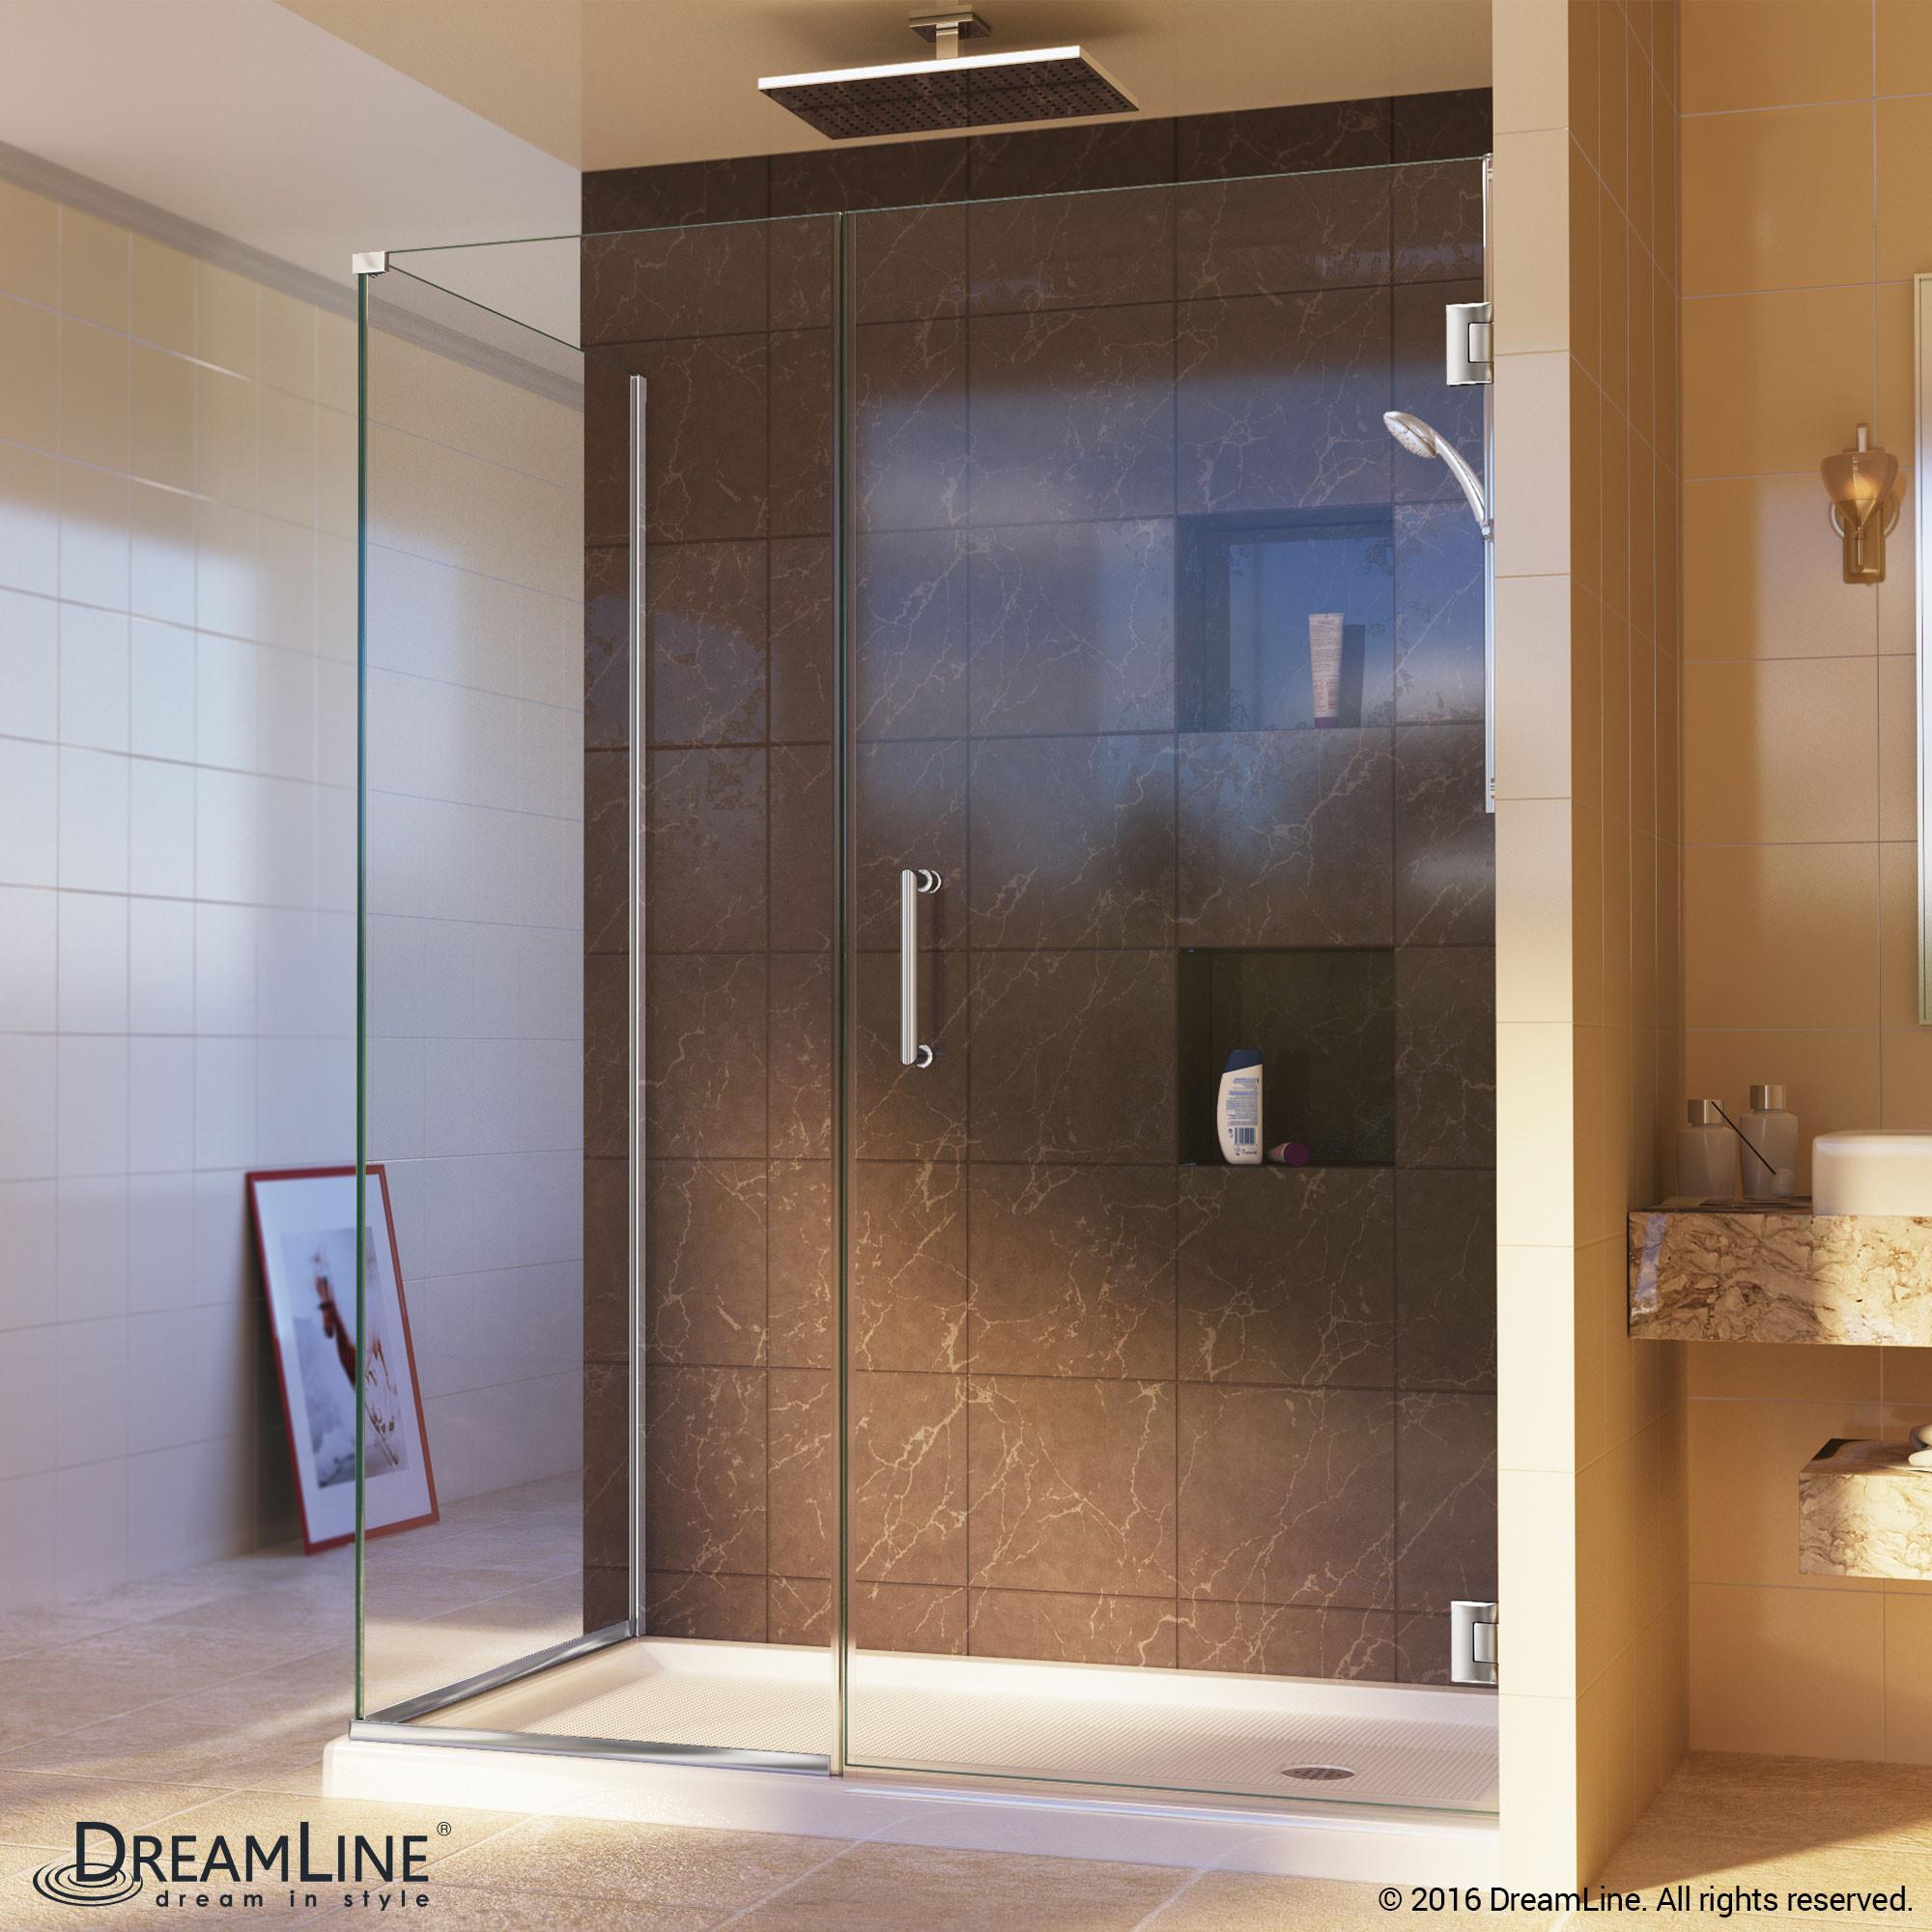 DreamLine SHEN-24470340-01 Unidoor Plus Hinged Shower Enclosure In Chrome Finish Hardware